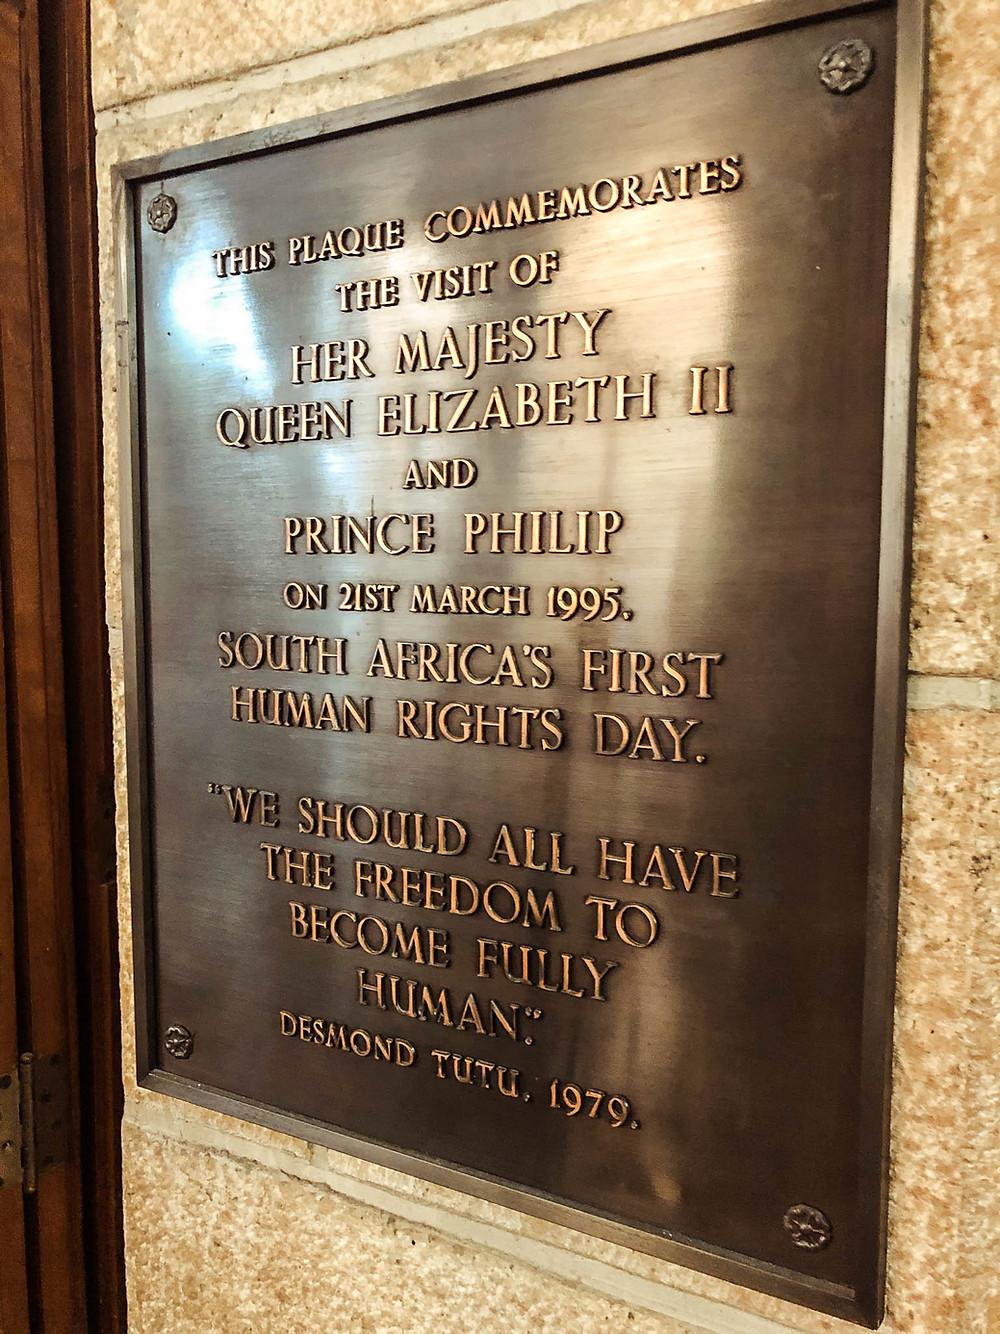 Archbishop Desmond Tutu's legacy still lives large in St. George's